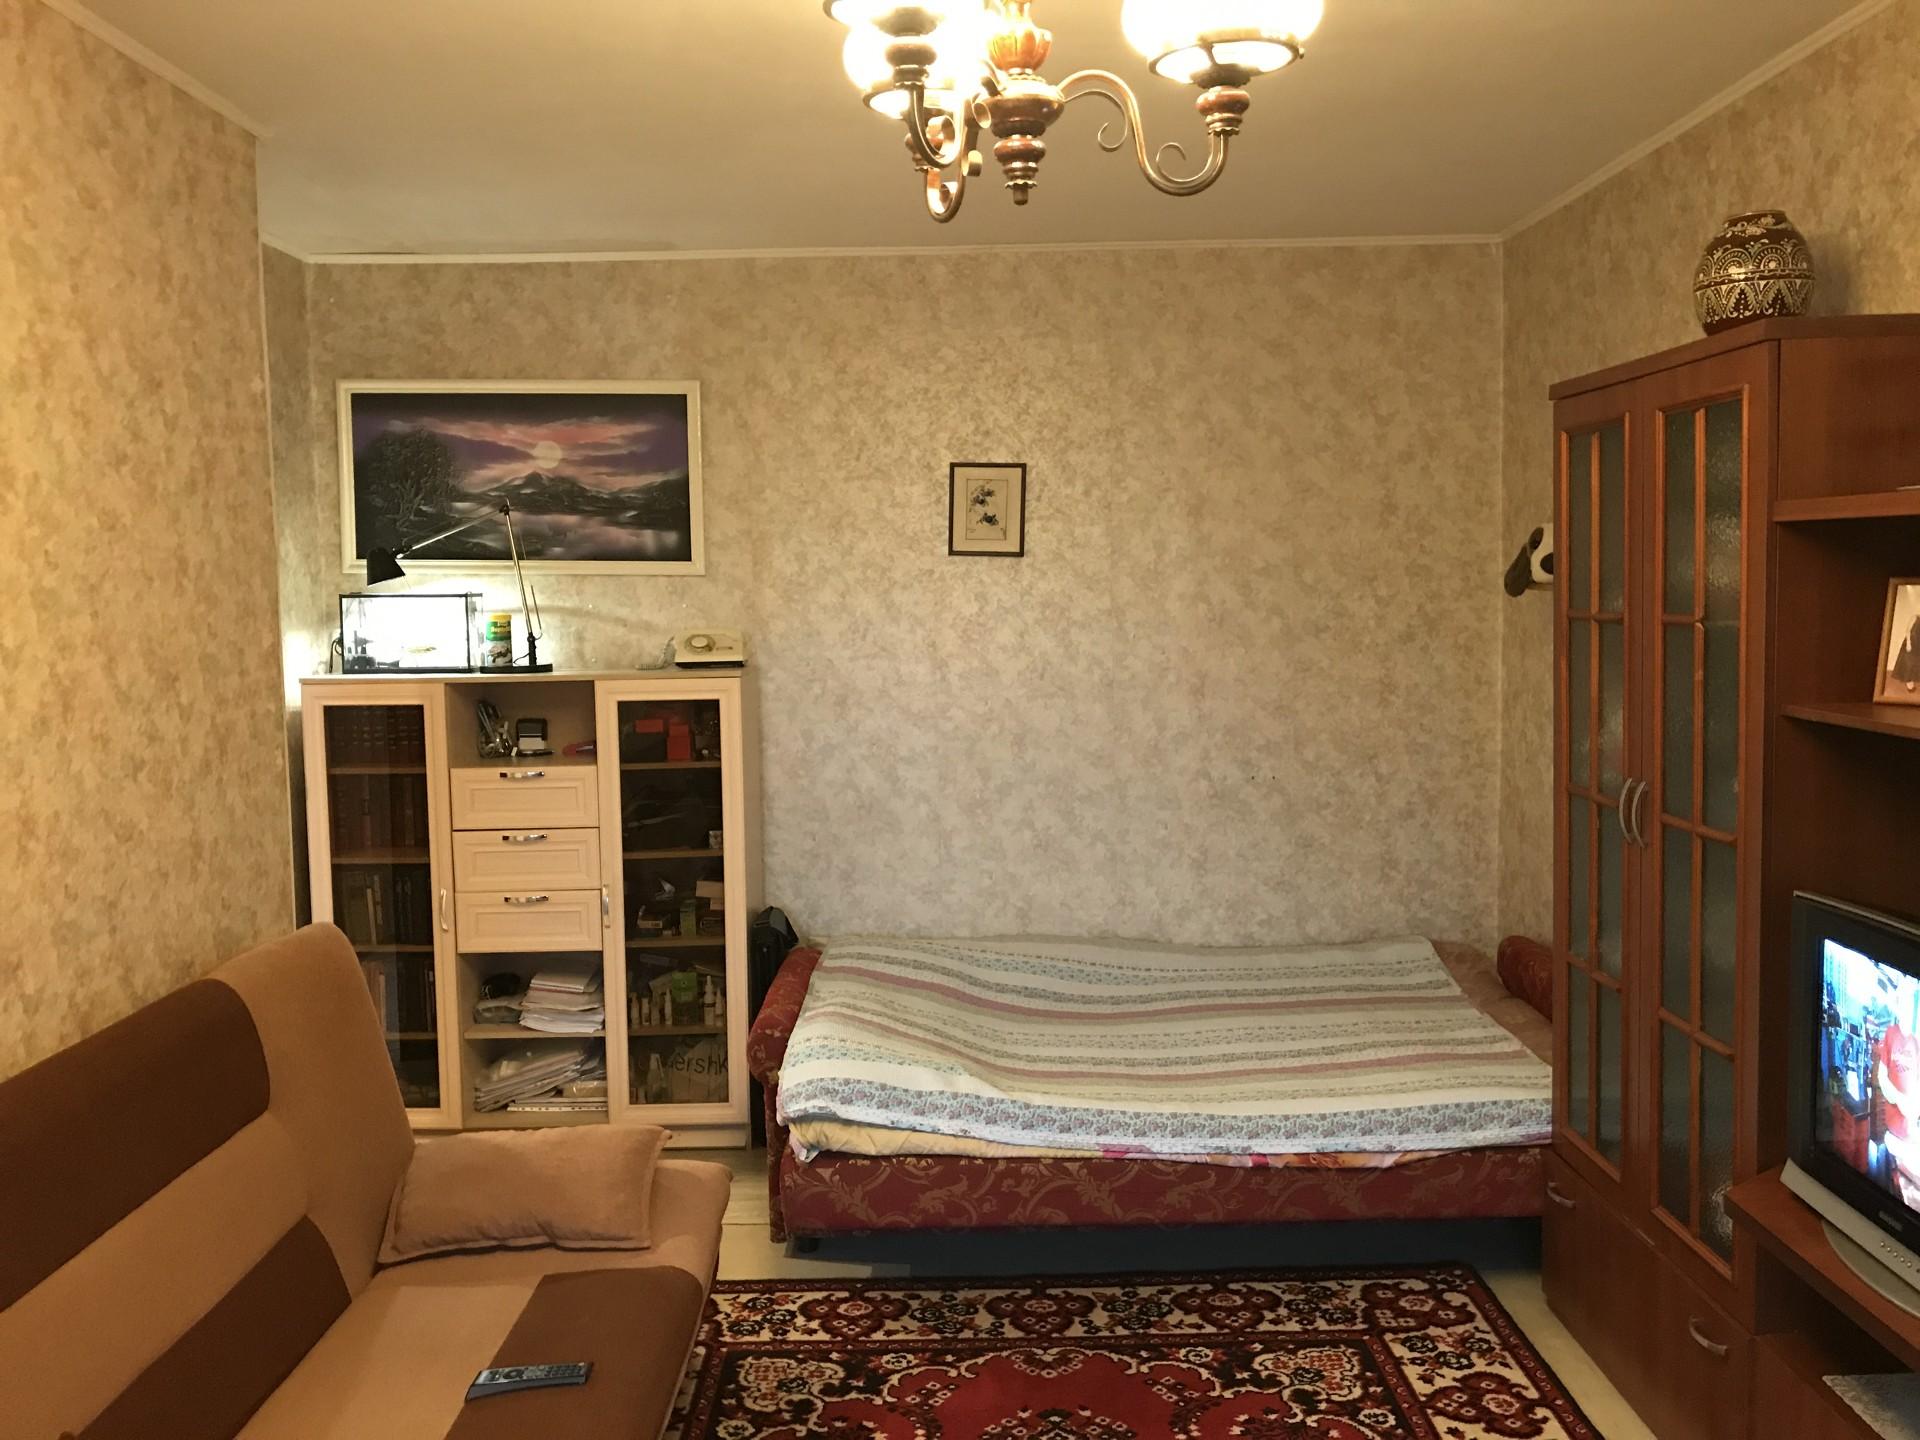 аренда с выкупом недвижимости москва